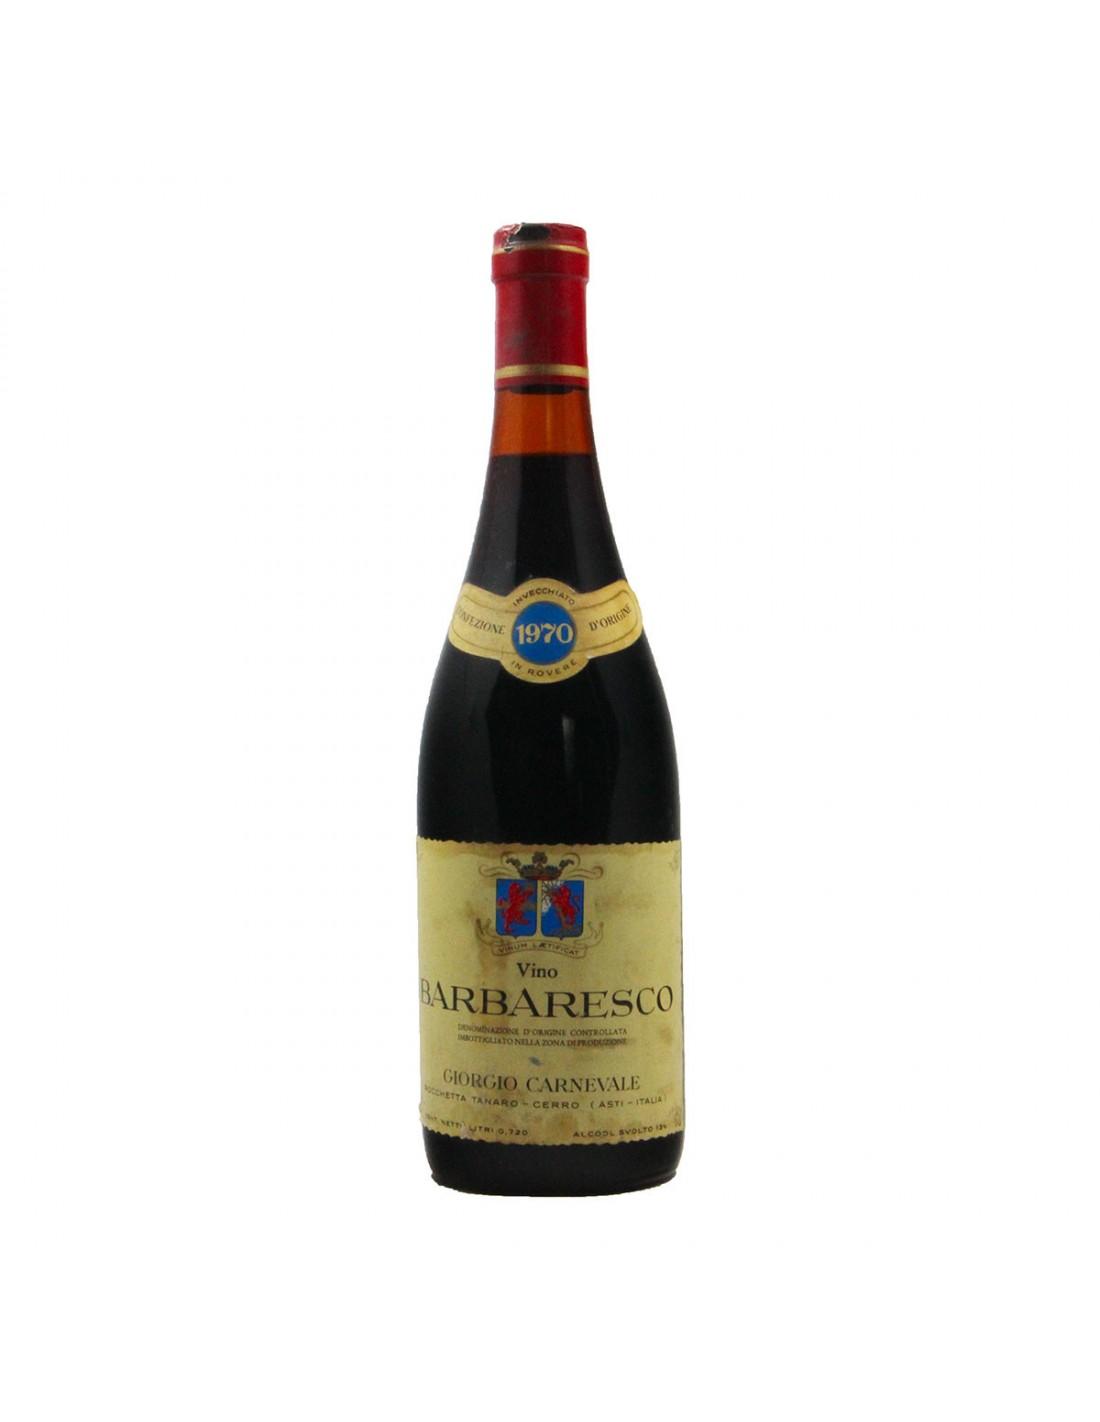 BARBARESCO 1970 GIORGIO CARNEVALE Grandi Bottiglie